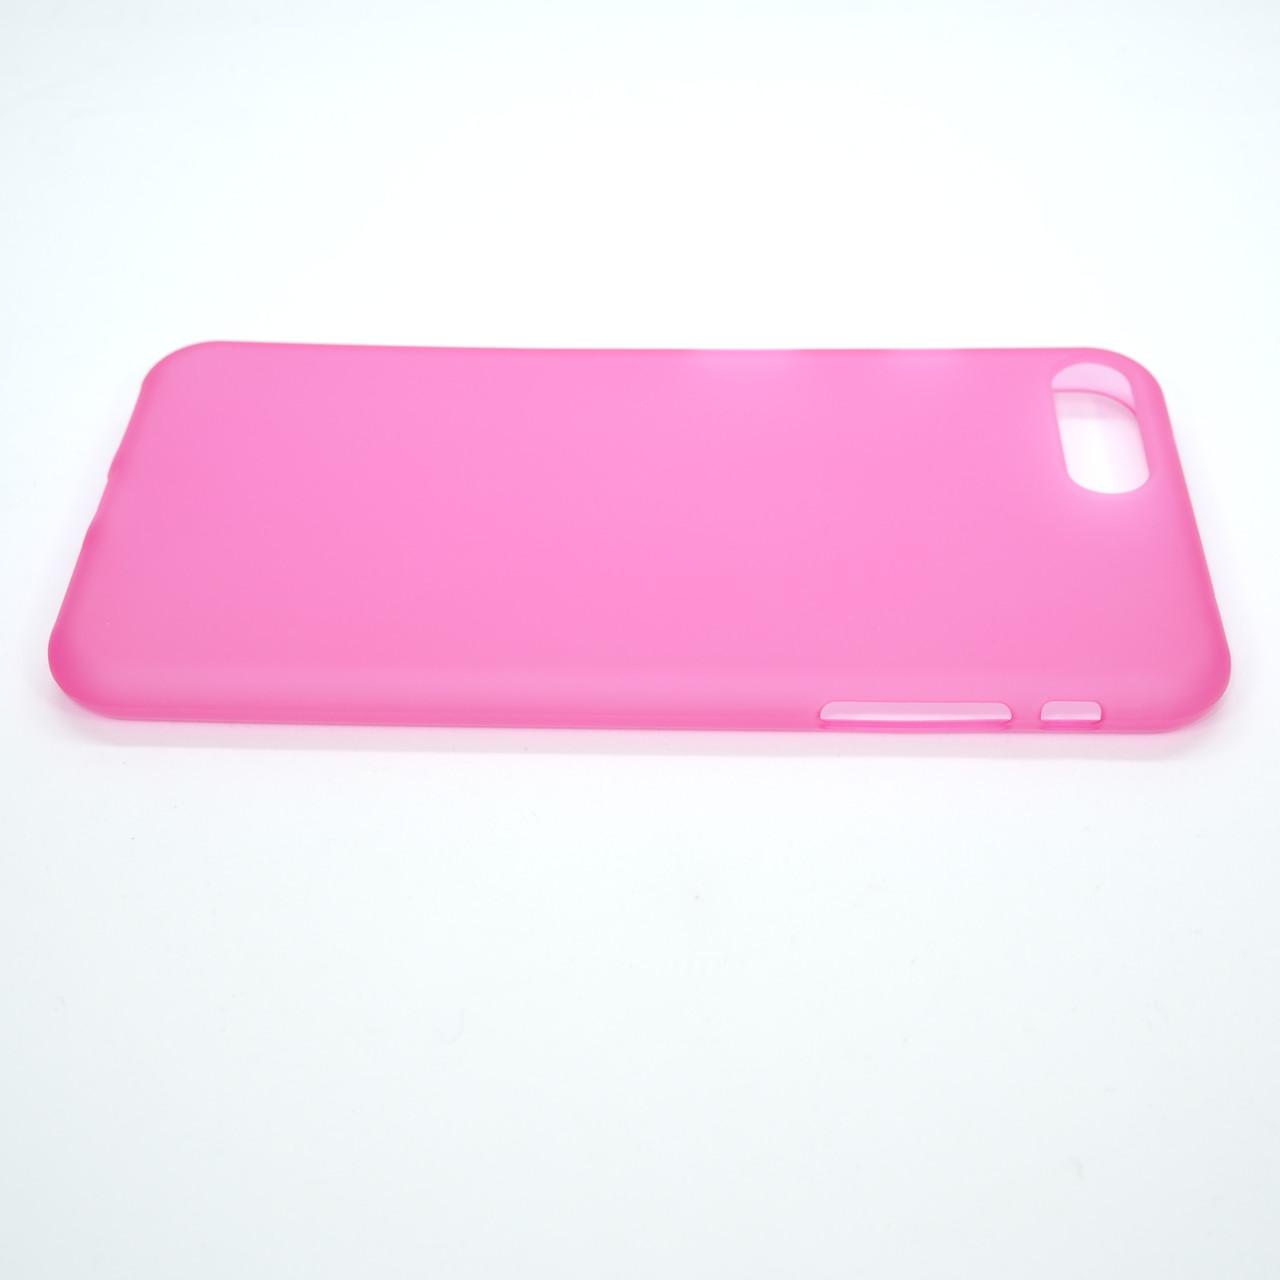 Чехол TPU iPhone 8 Plus 7 pink Для телефона